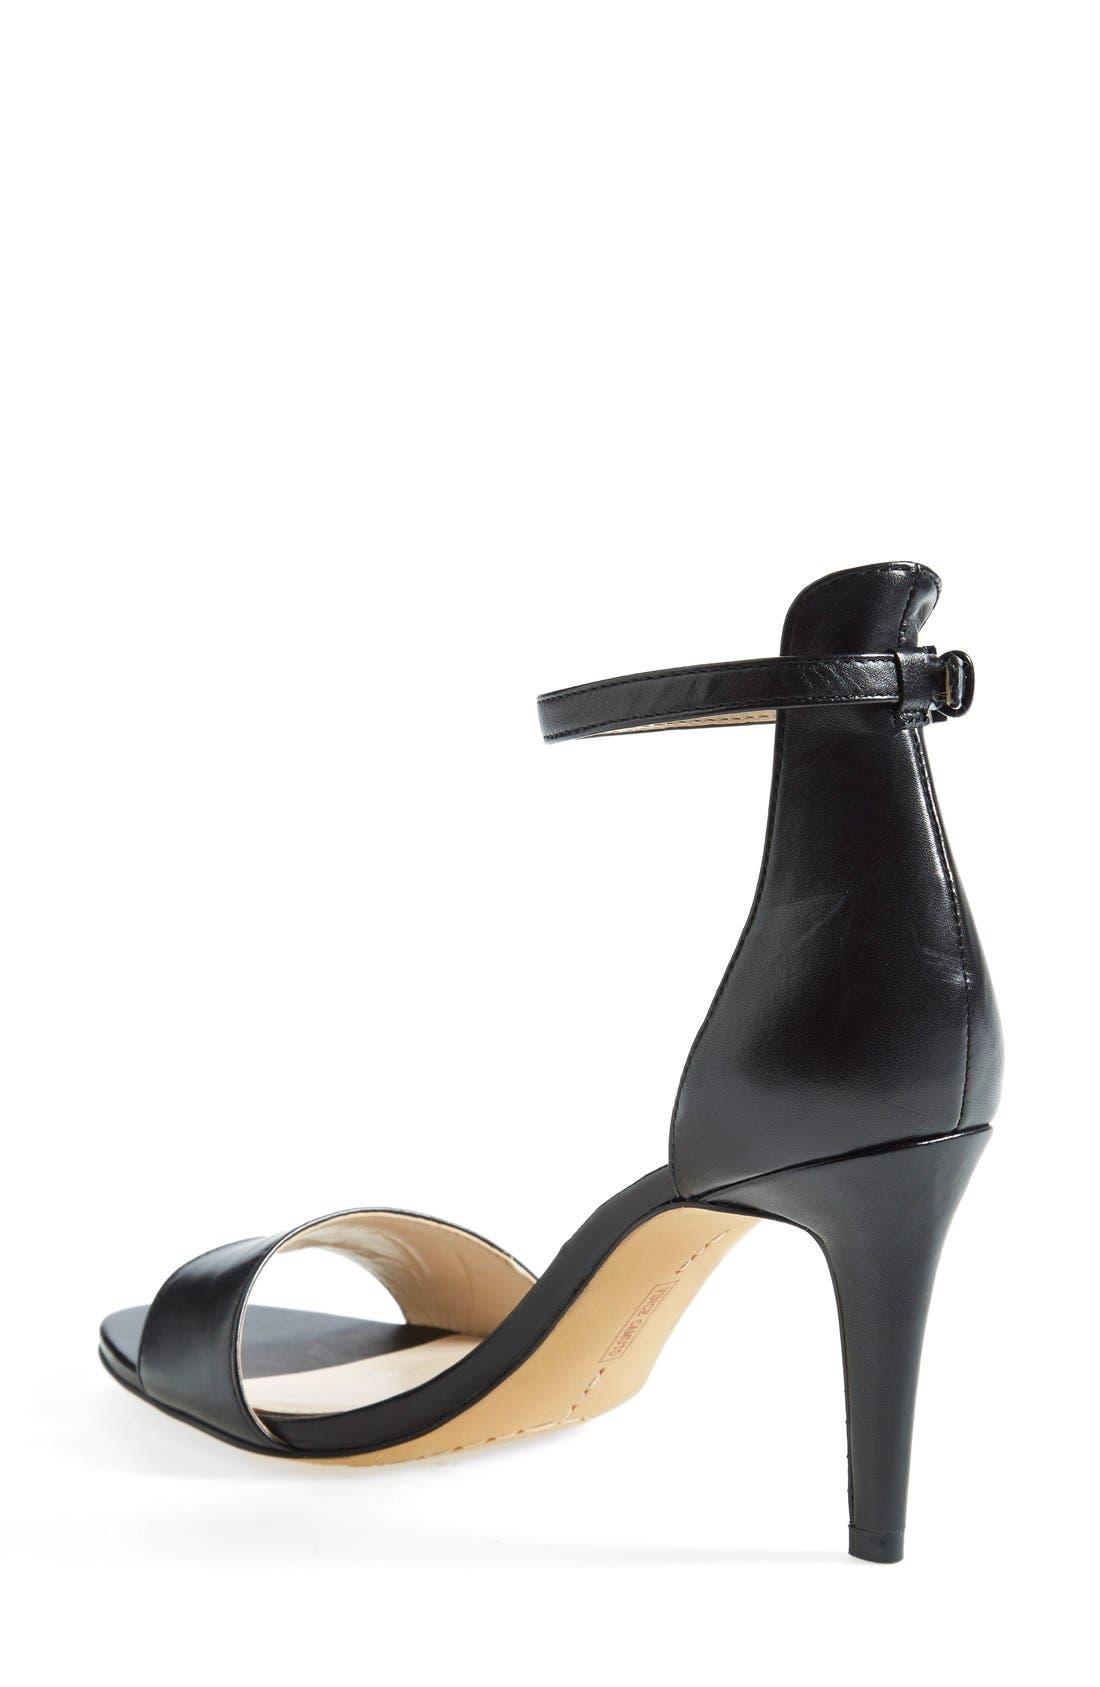 VINCE CAMUTO, 'Court' Ankle Strap Sandal, Alternate thumbnail 3, color, 001